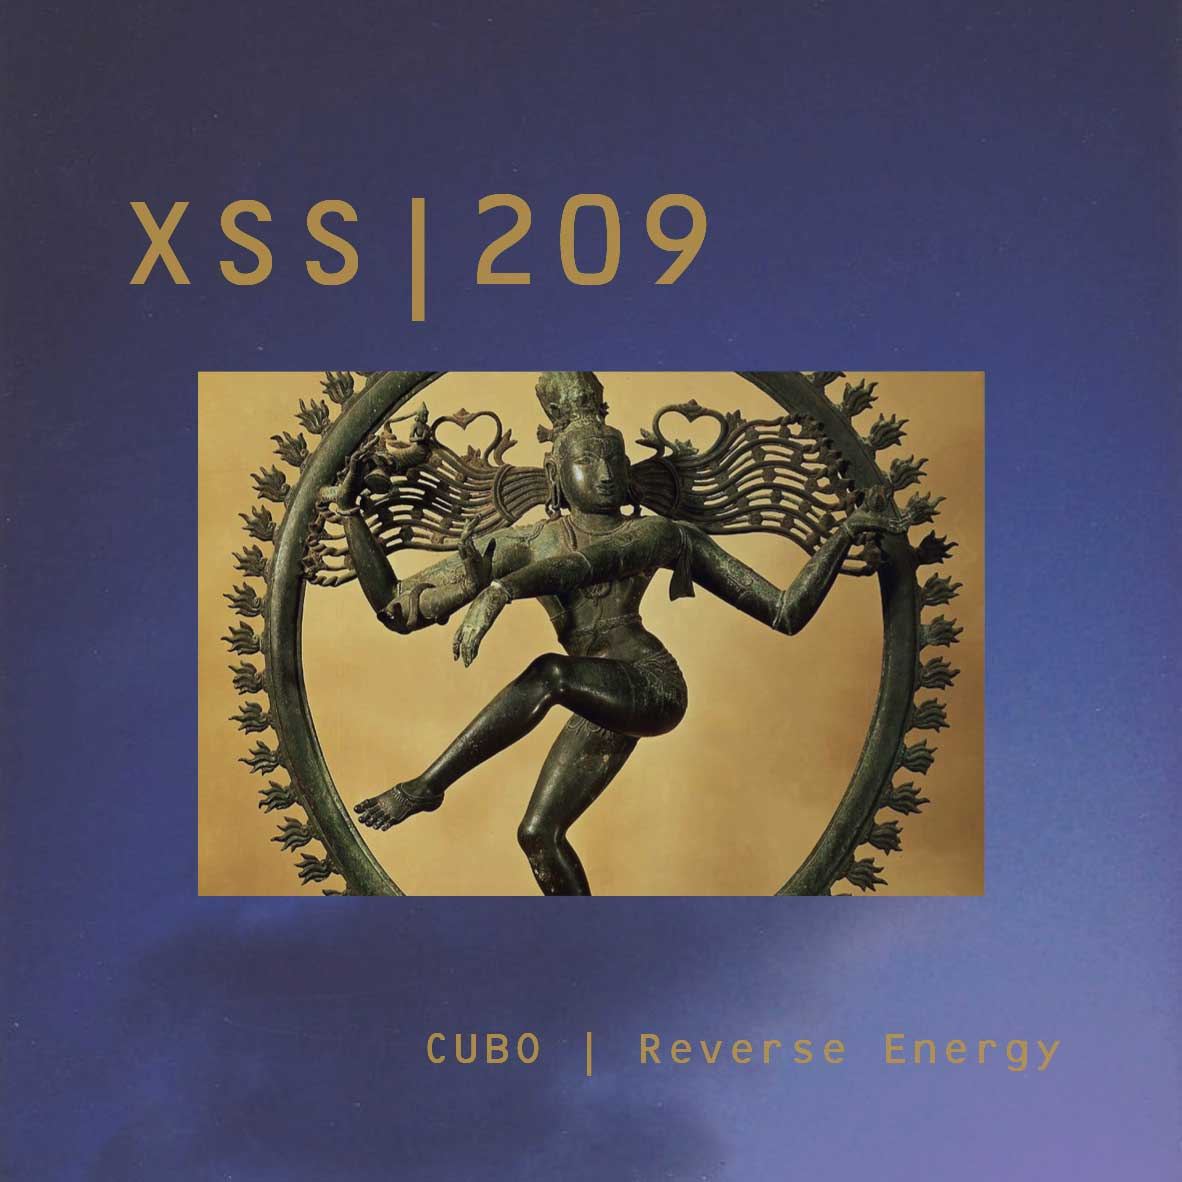 XSS209 | Cubo | Reverse Energy